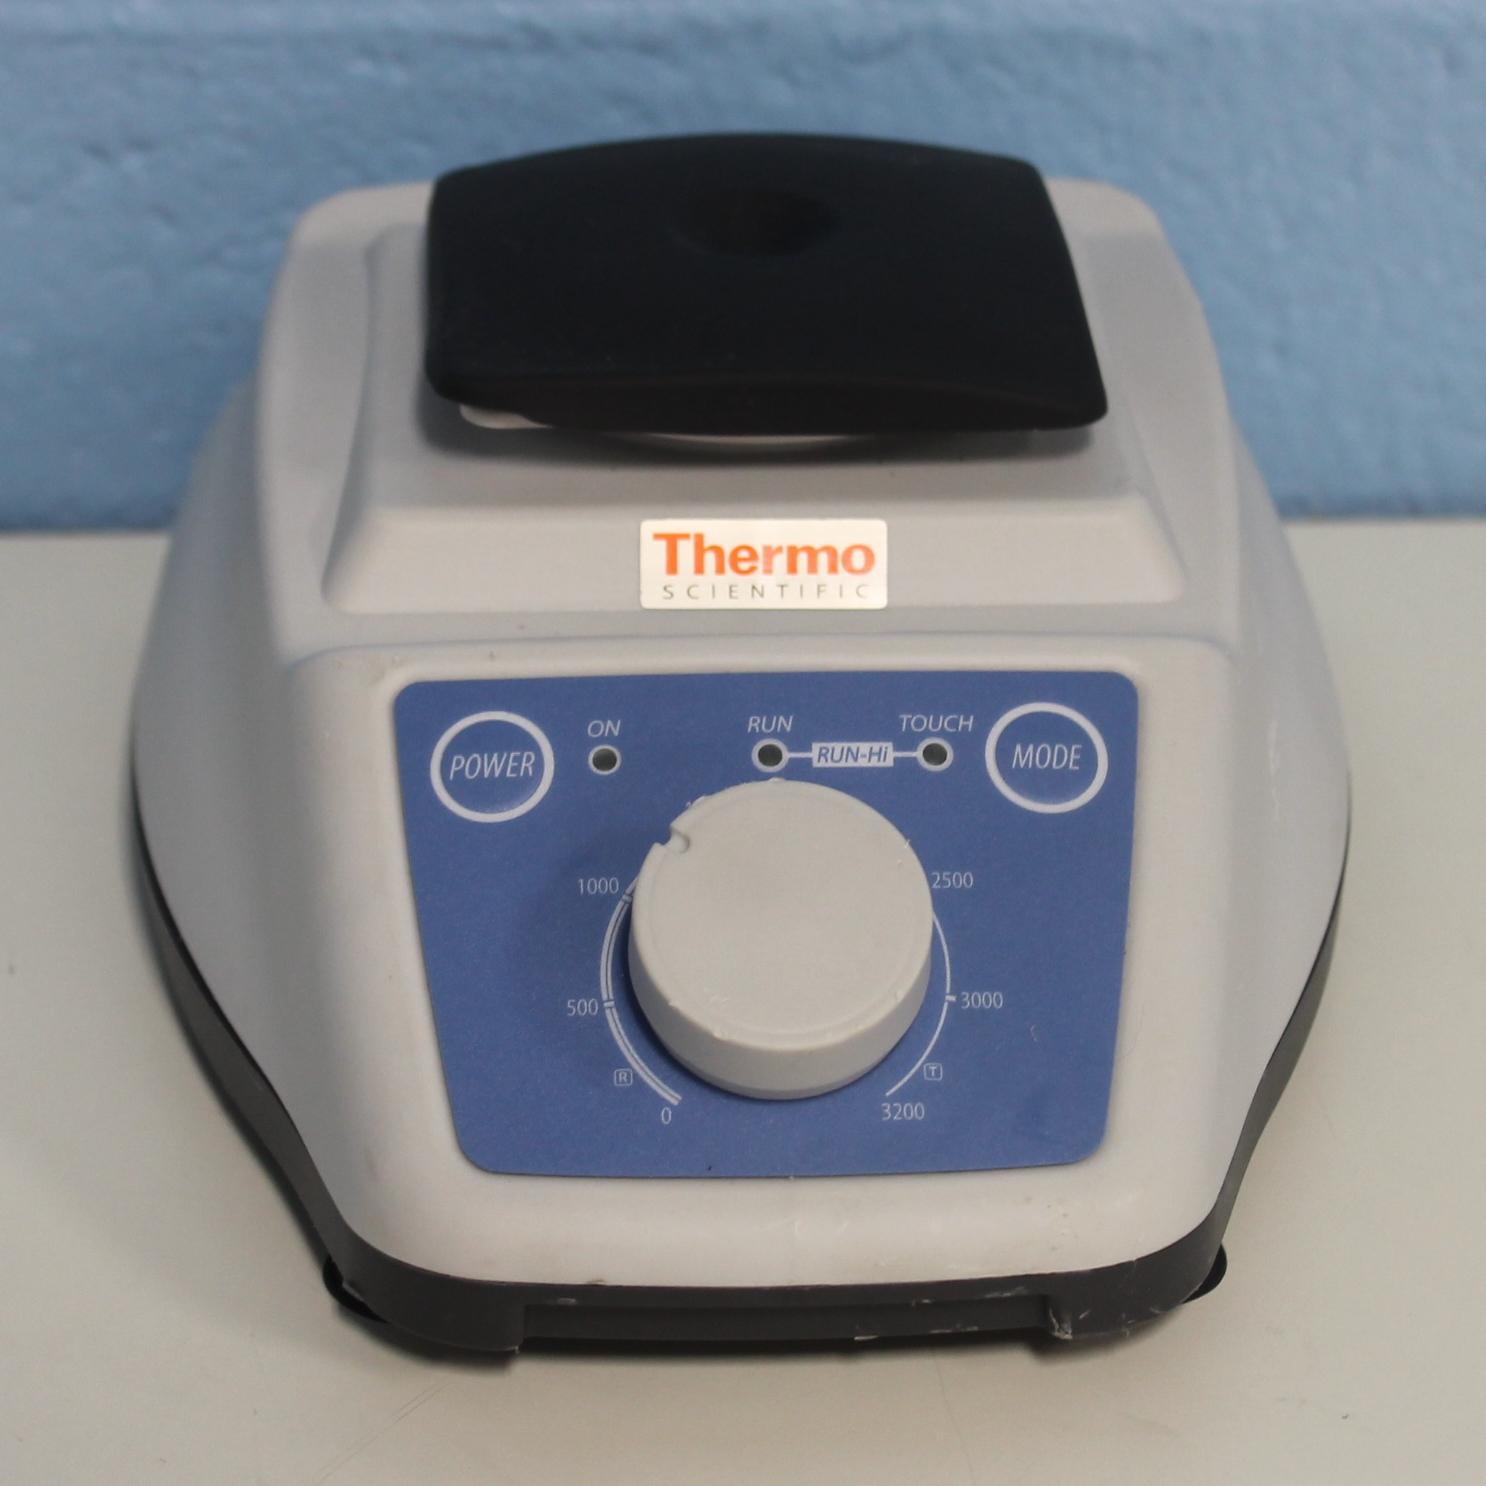 Thermo Scientific LP Vortex Mixer CAT No. 88880017 Image